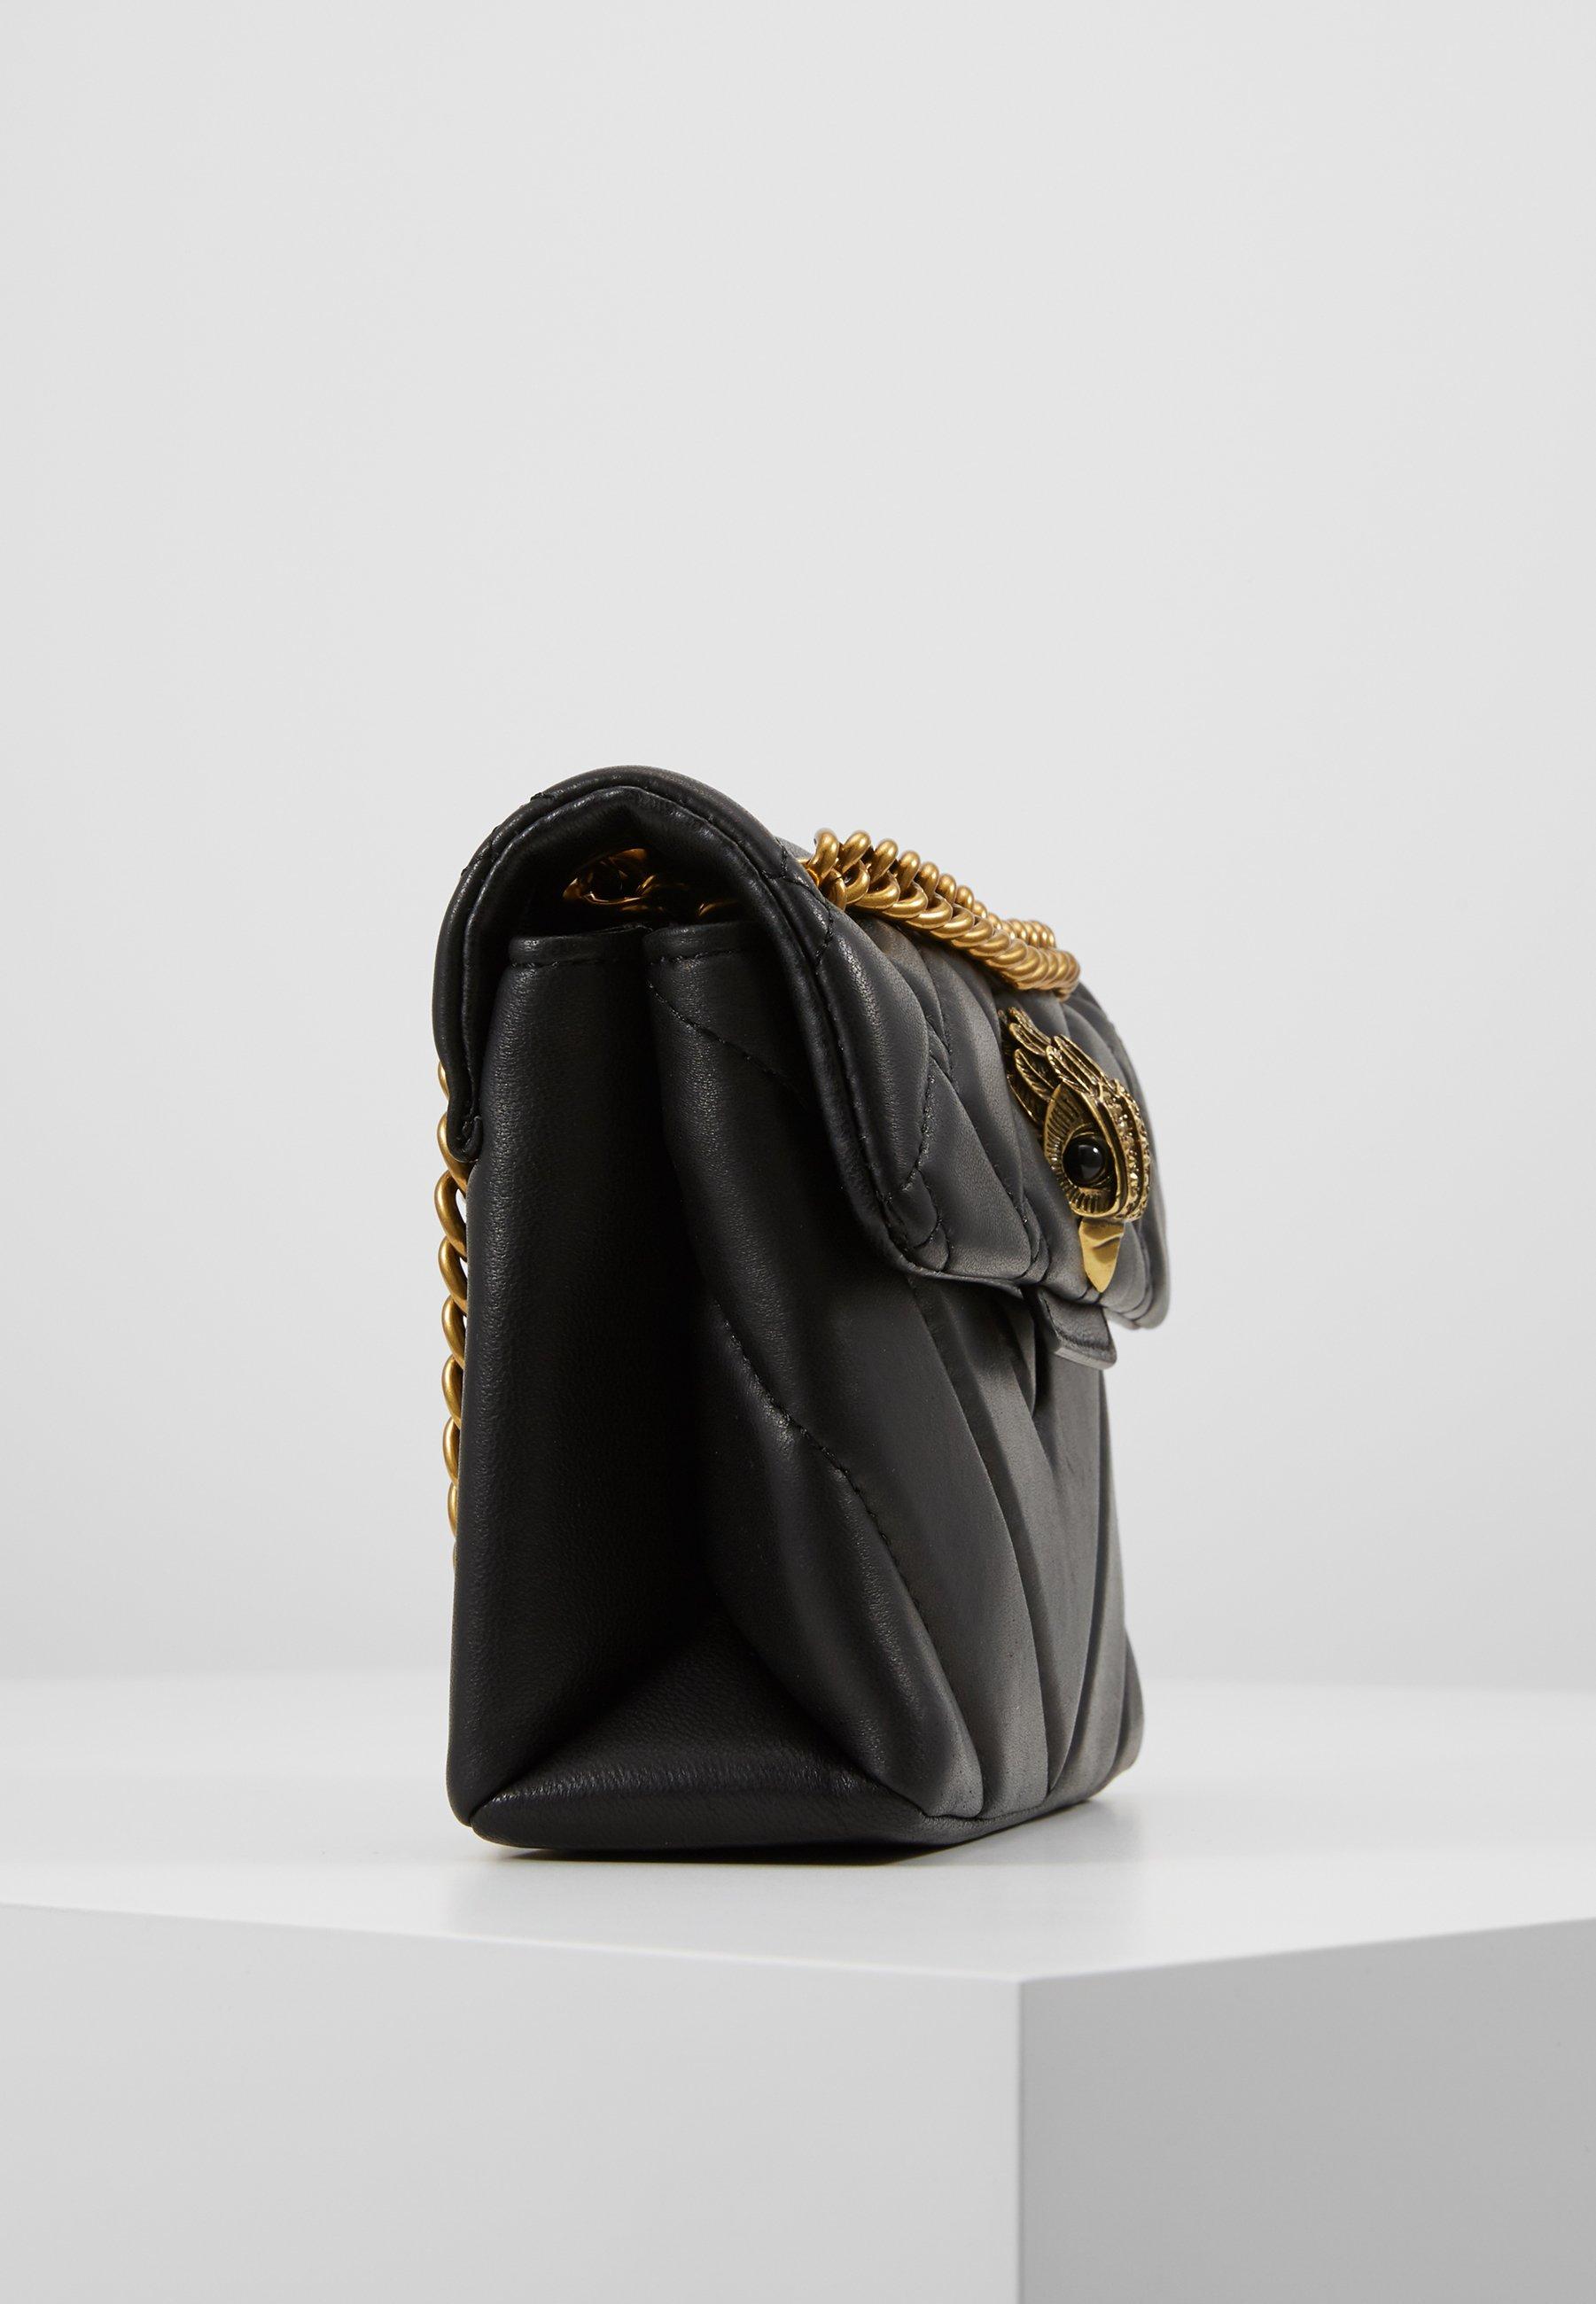 Kurt Geiger London Mini Kensington X Bag - Sac Bandoulière Black